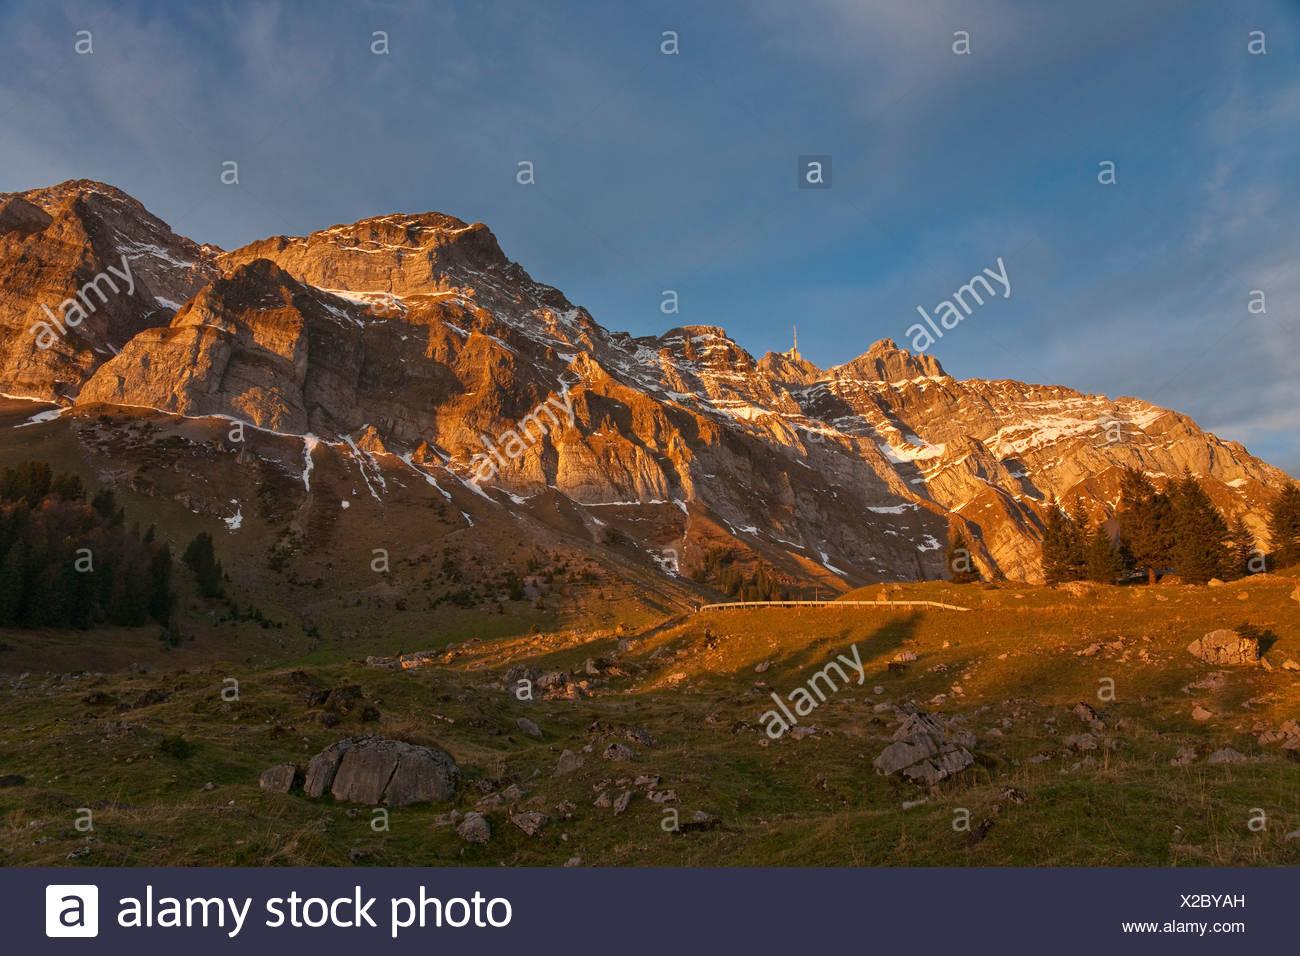 Säntis-Kanton Appenzell Innerrhoden Schweiz Bergmassiv der Alpen Alpsteingebirge Berge Landschaft Gipfel Spitzberg Stockbild